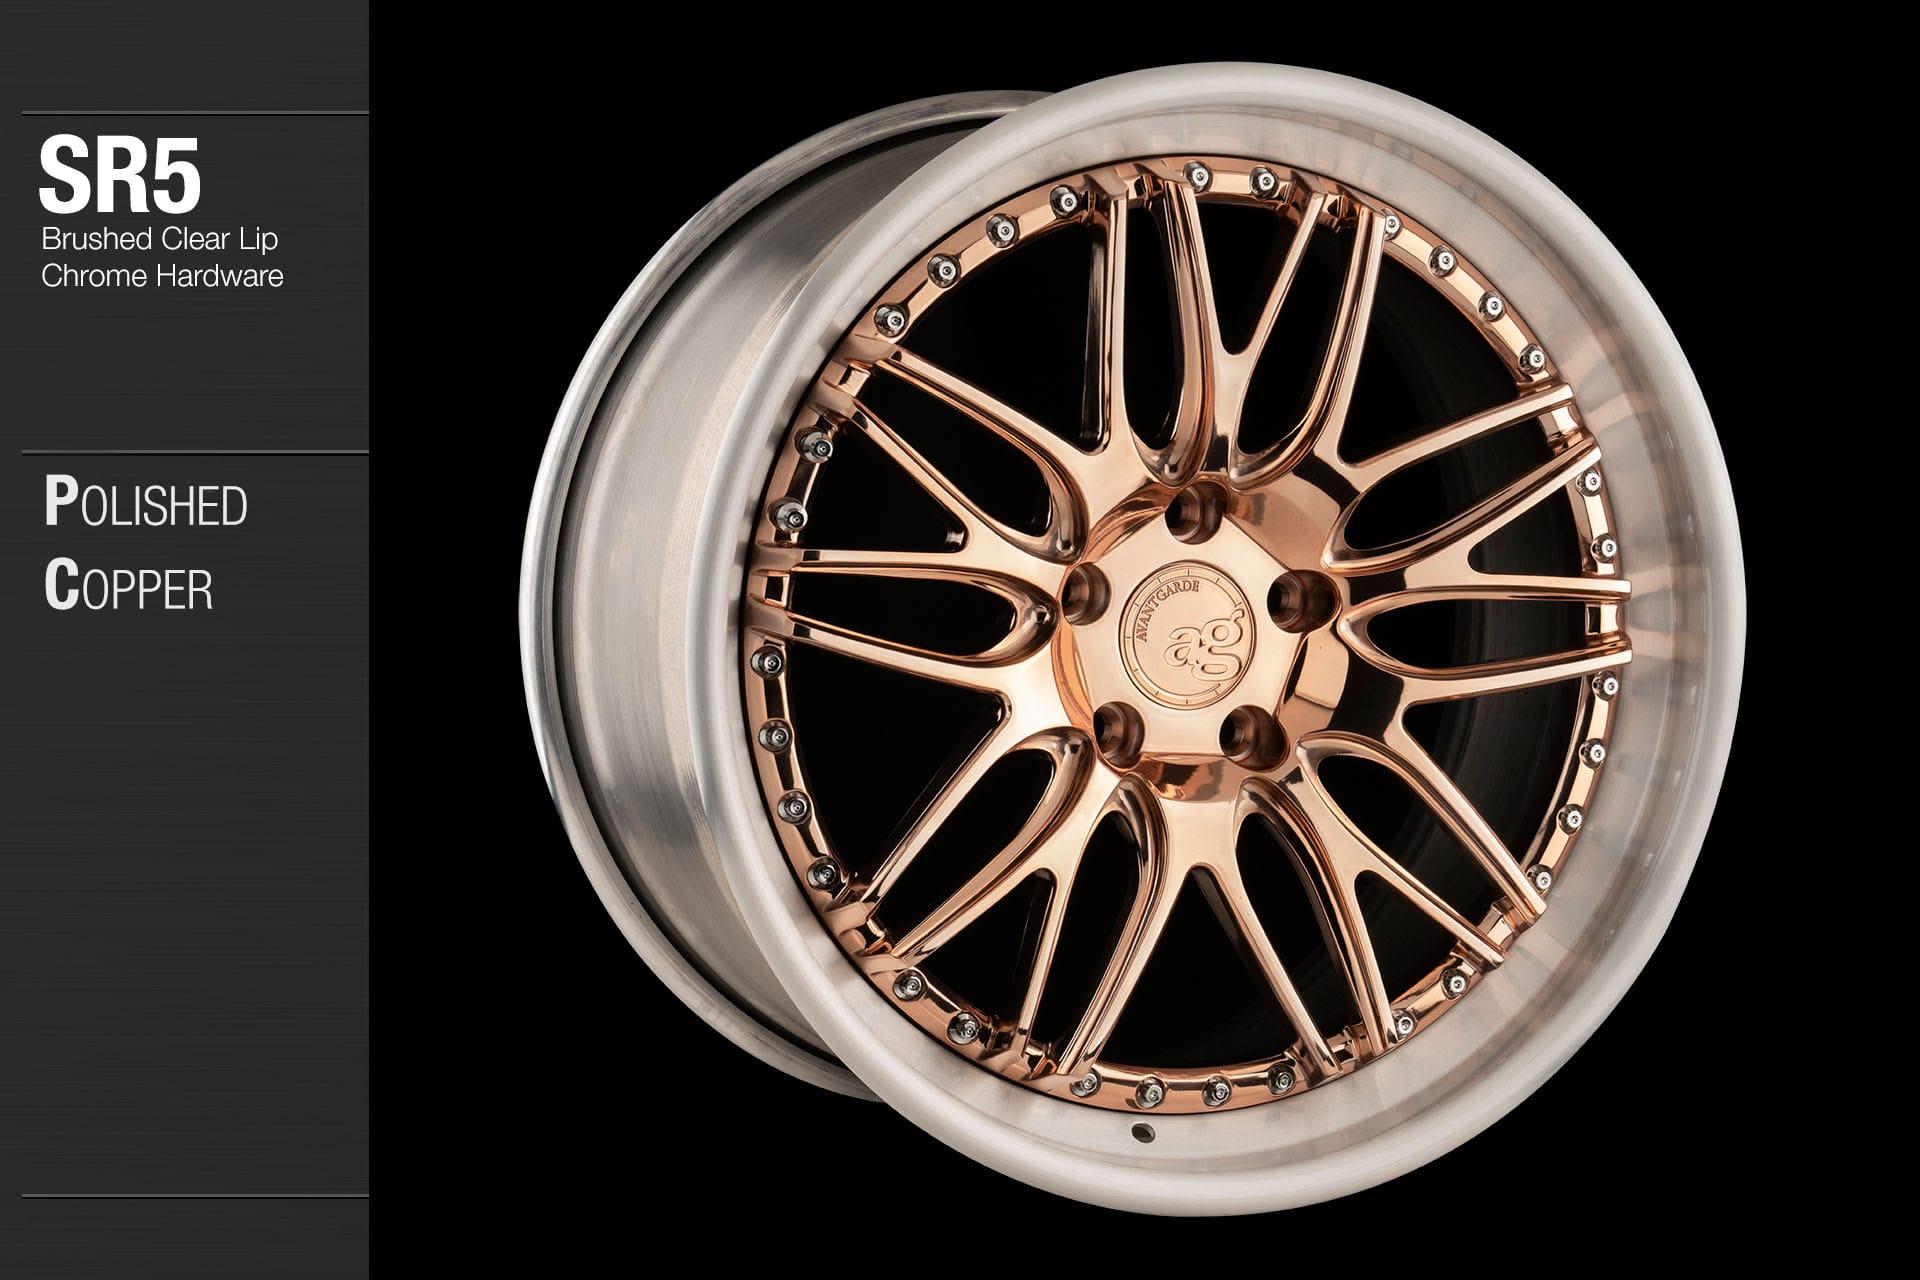 avant-garde-ag-wheels-sr5-polished-copper-face-brushed-clear-lip-chrome-hardware-4